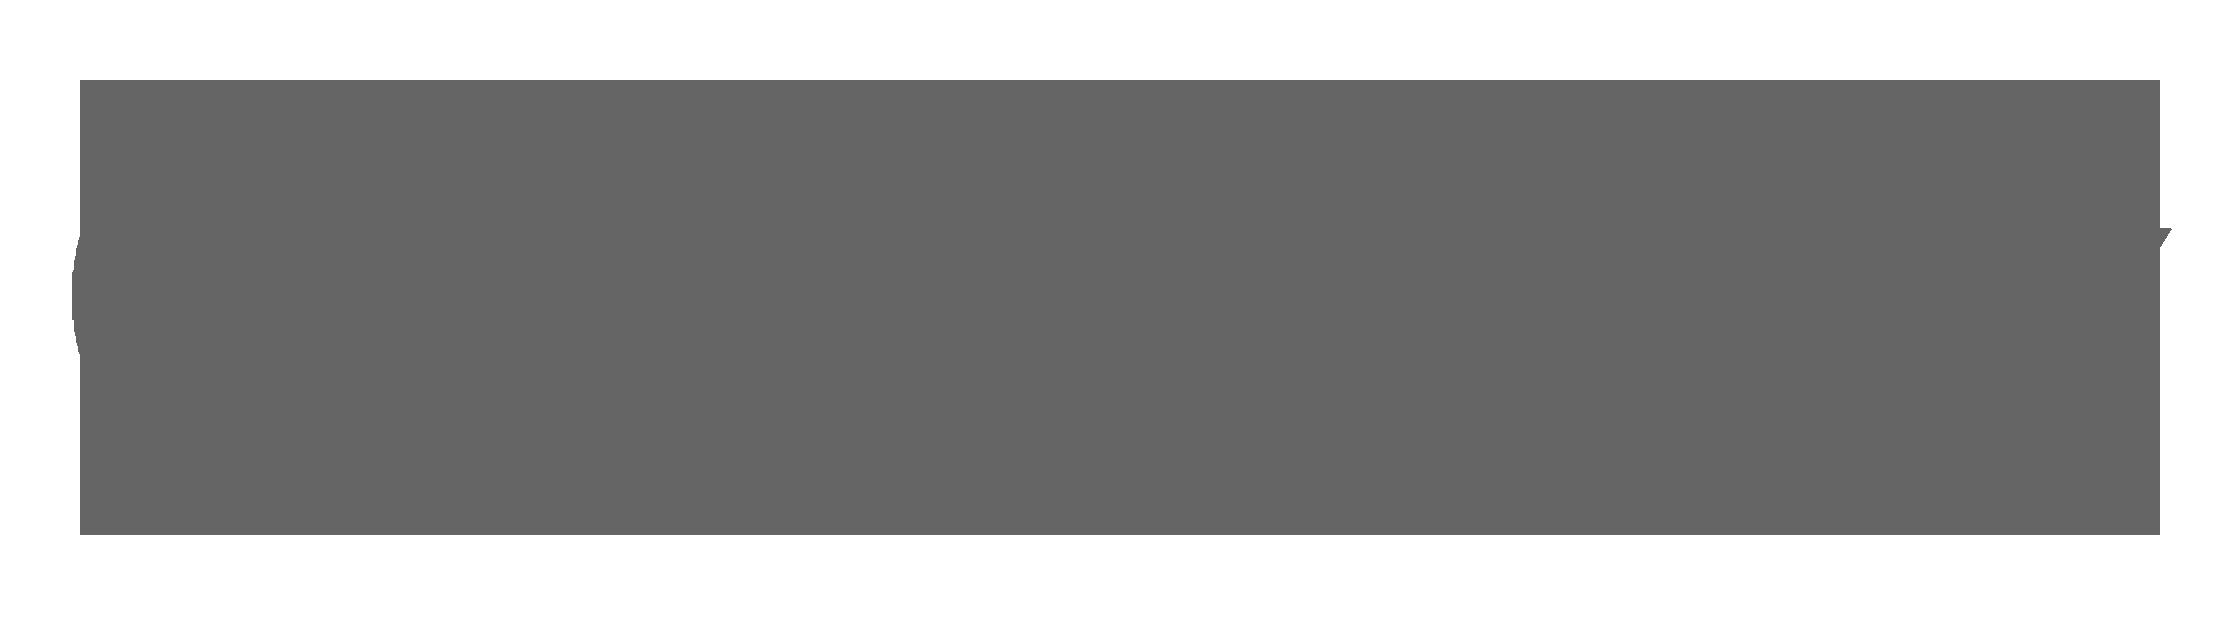 https://f.hubspotusercontent30.net/hubfs/4436636/fidelity-logo-new.png